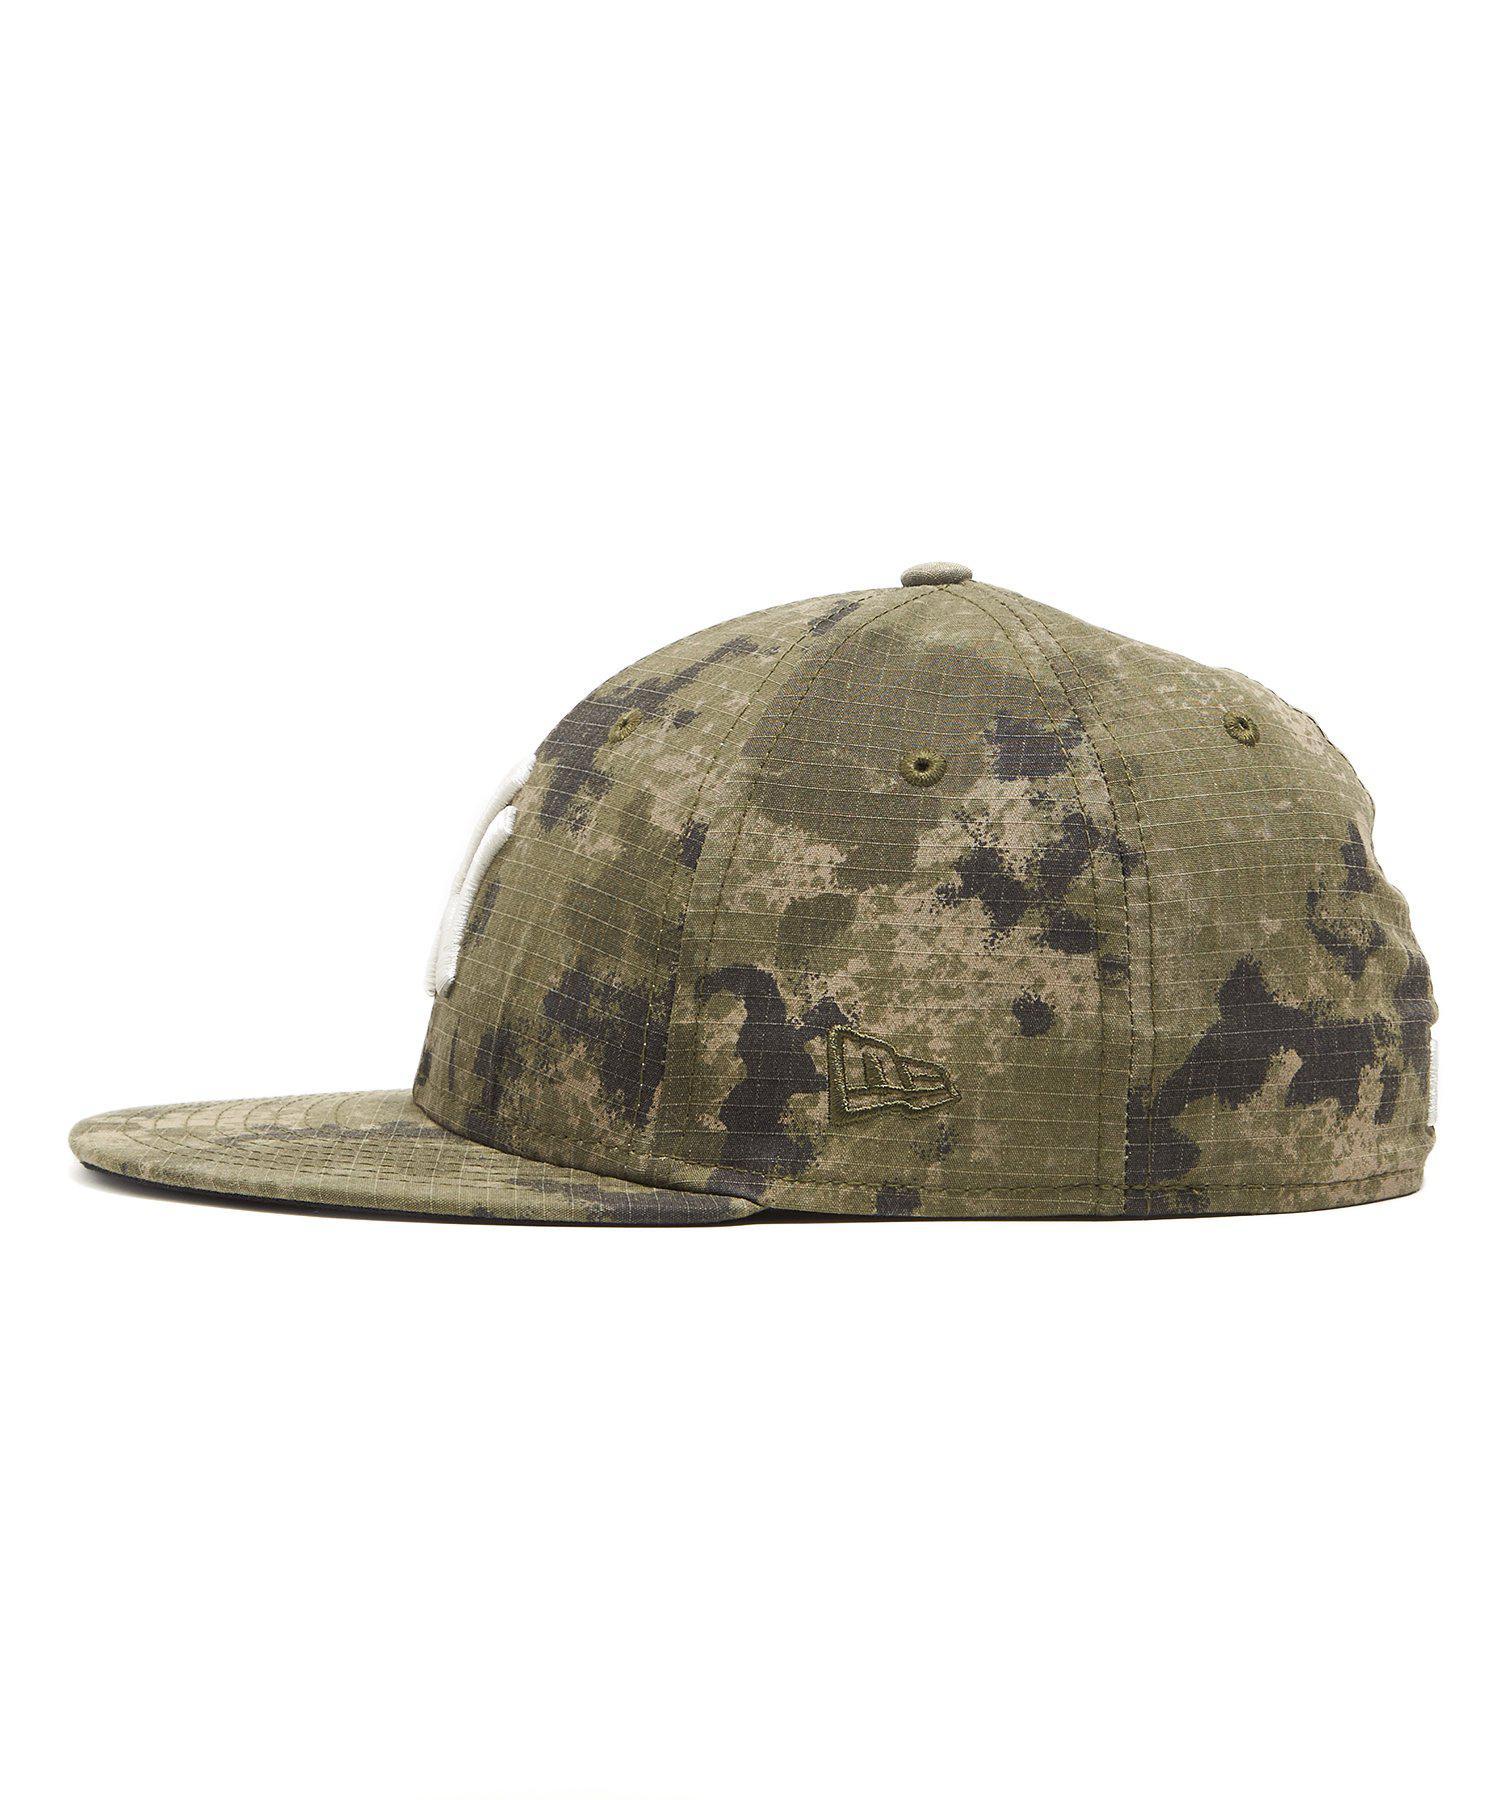 3e04006f148 Lyst - NEW ERA HATS New York Yankees Cap In Camo Ripstop in Green ...